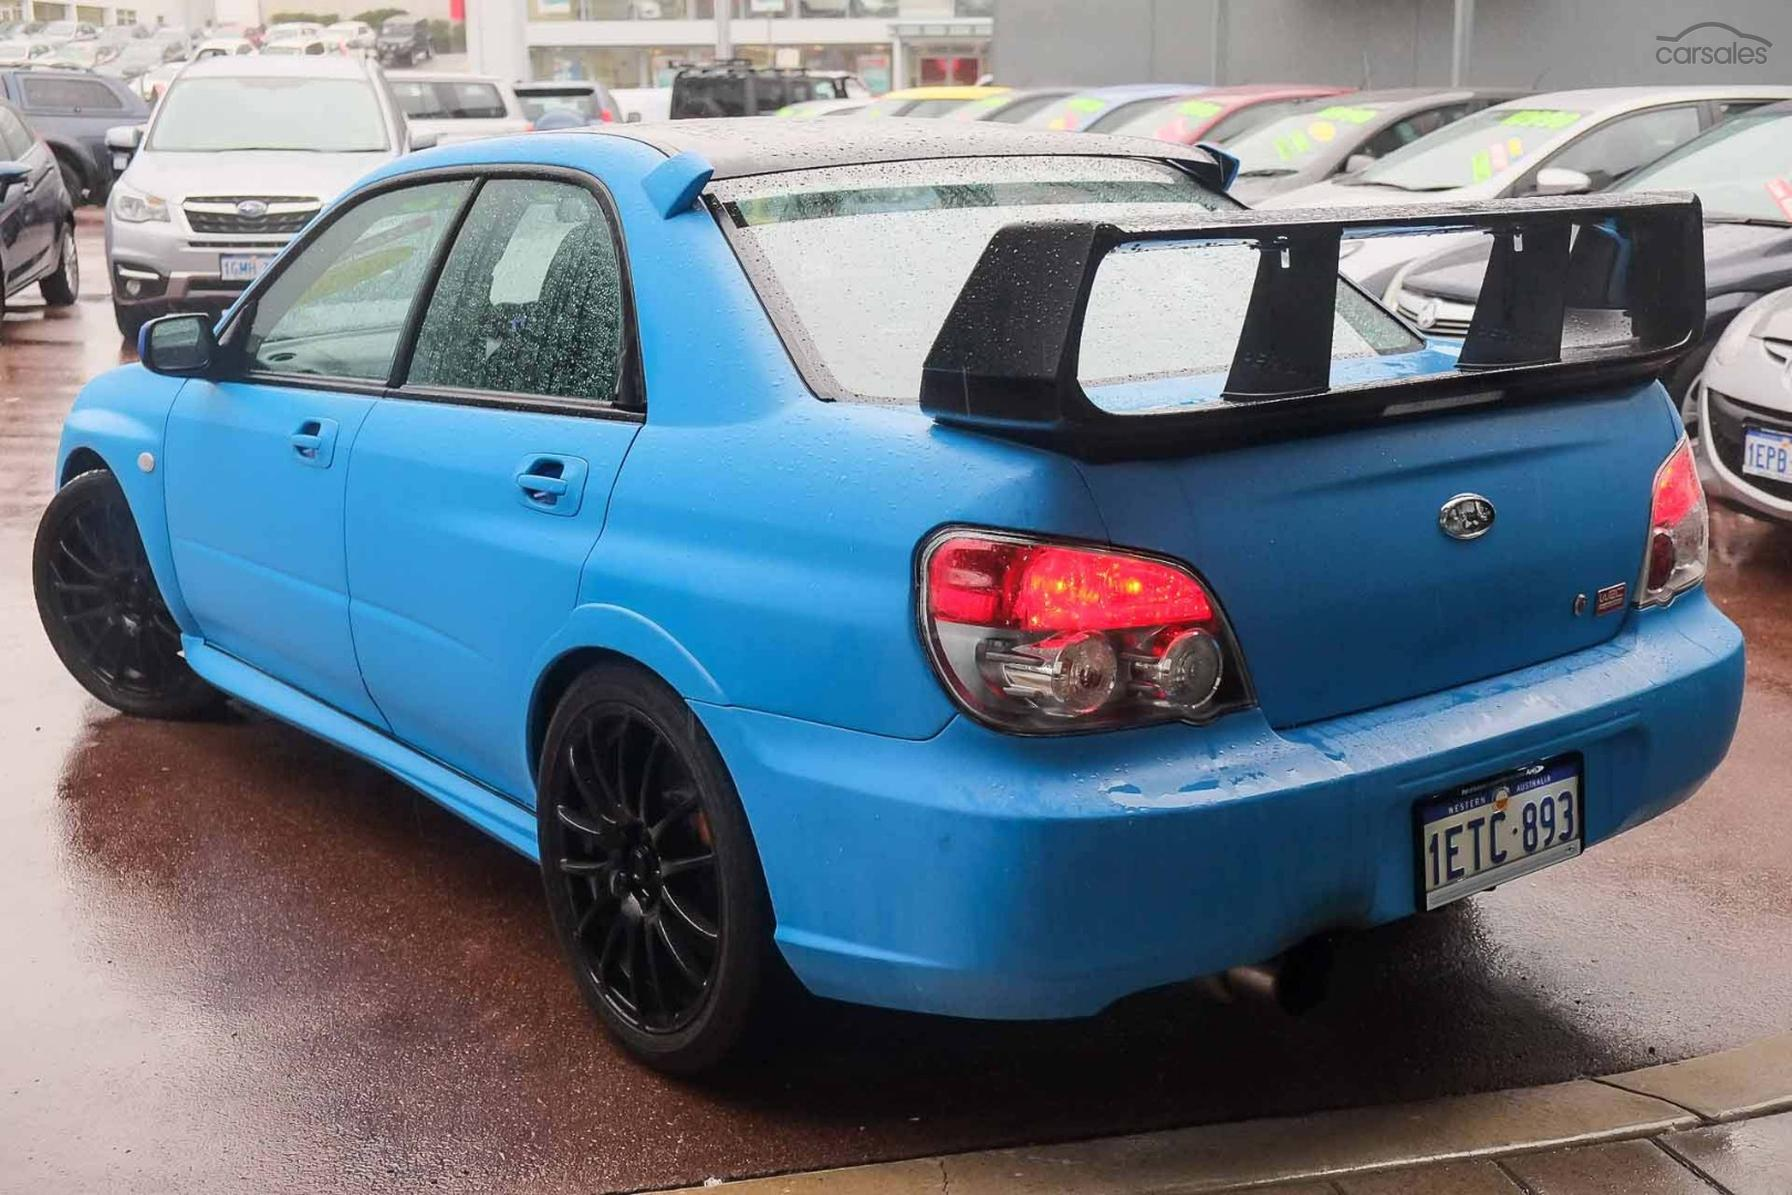 2005 Subaru Impreza Wrx Sti S Manual Awd My06 Oag Ad 16021552 Interior Illumination Wiring